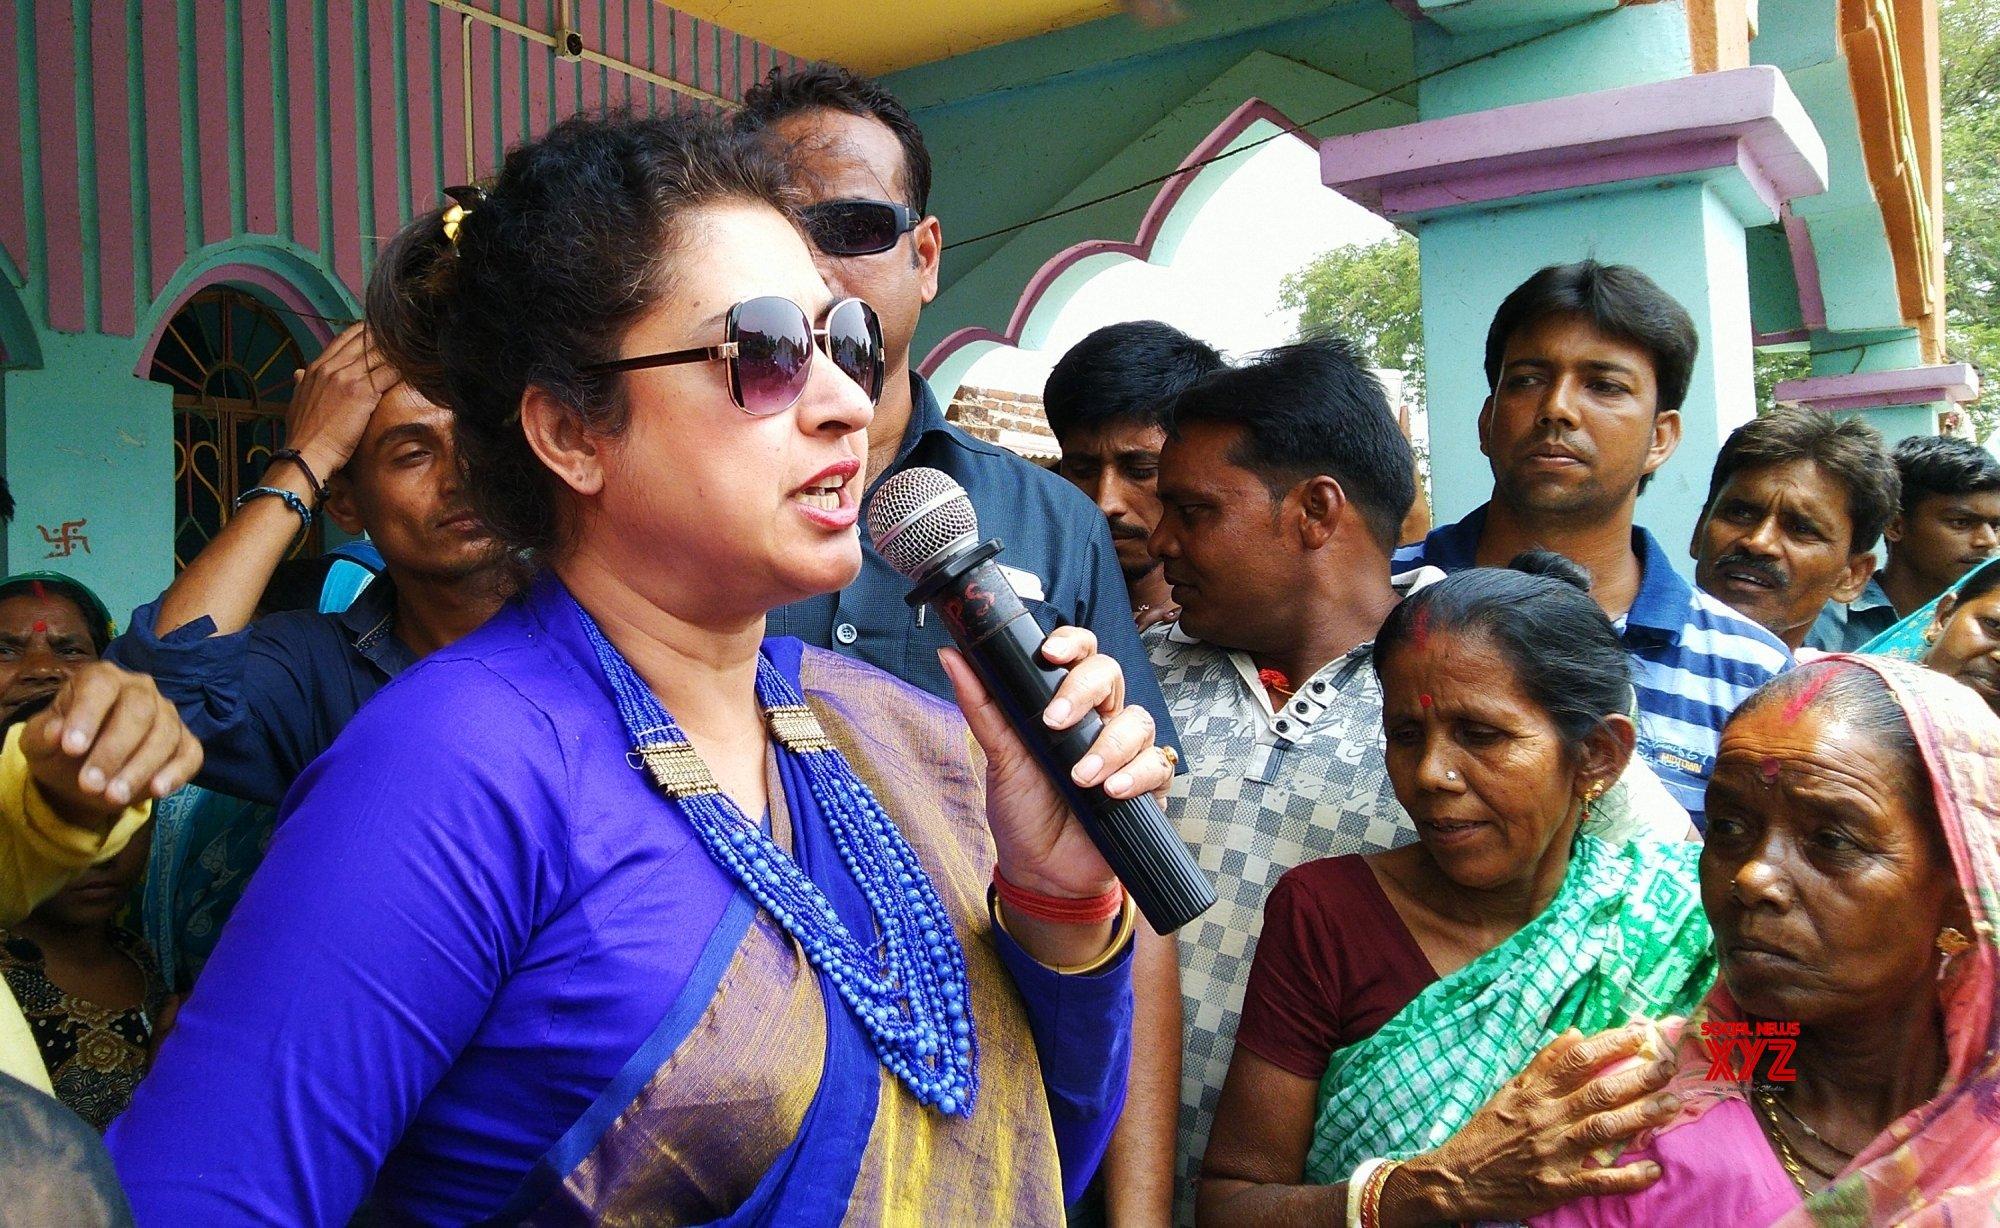 Birbhum (West Bengal): 2019 Lok Sabha elections - TMC's Satabdi Roy during poll campaign #Gallery